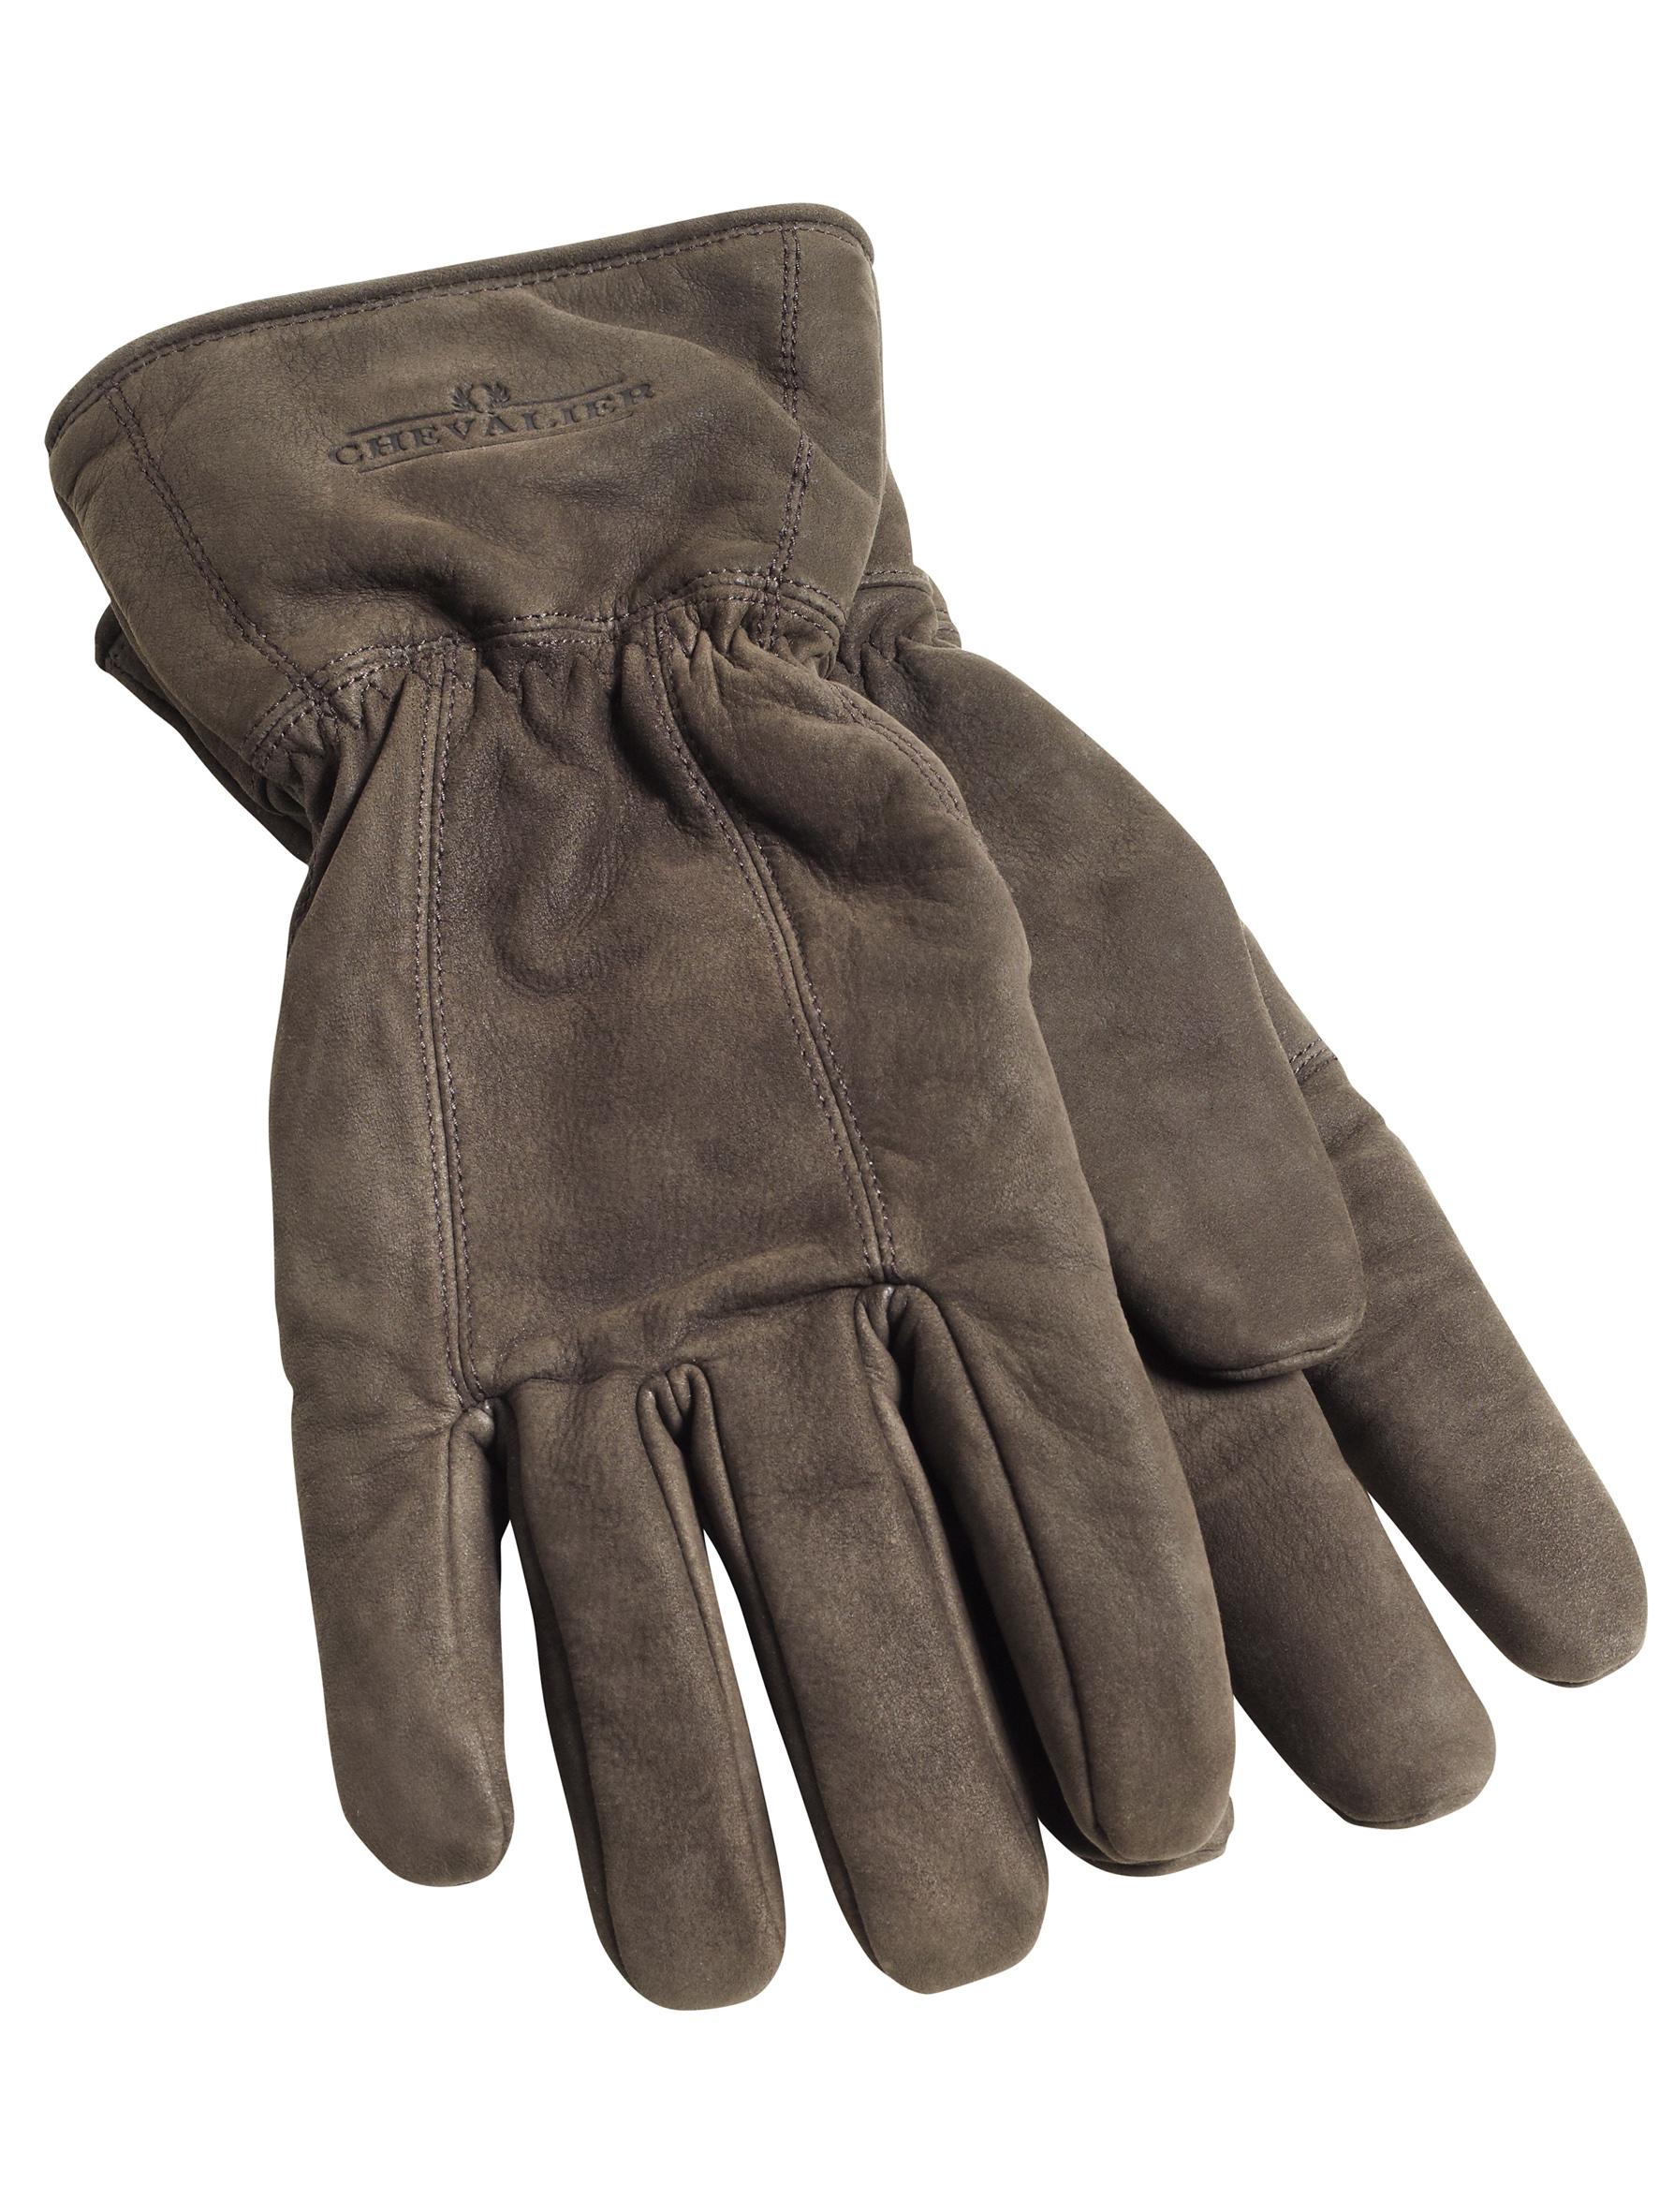 Chevalier Aragon Leather Glove Handske